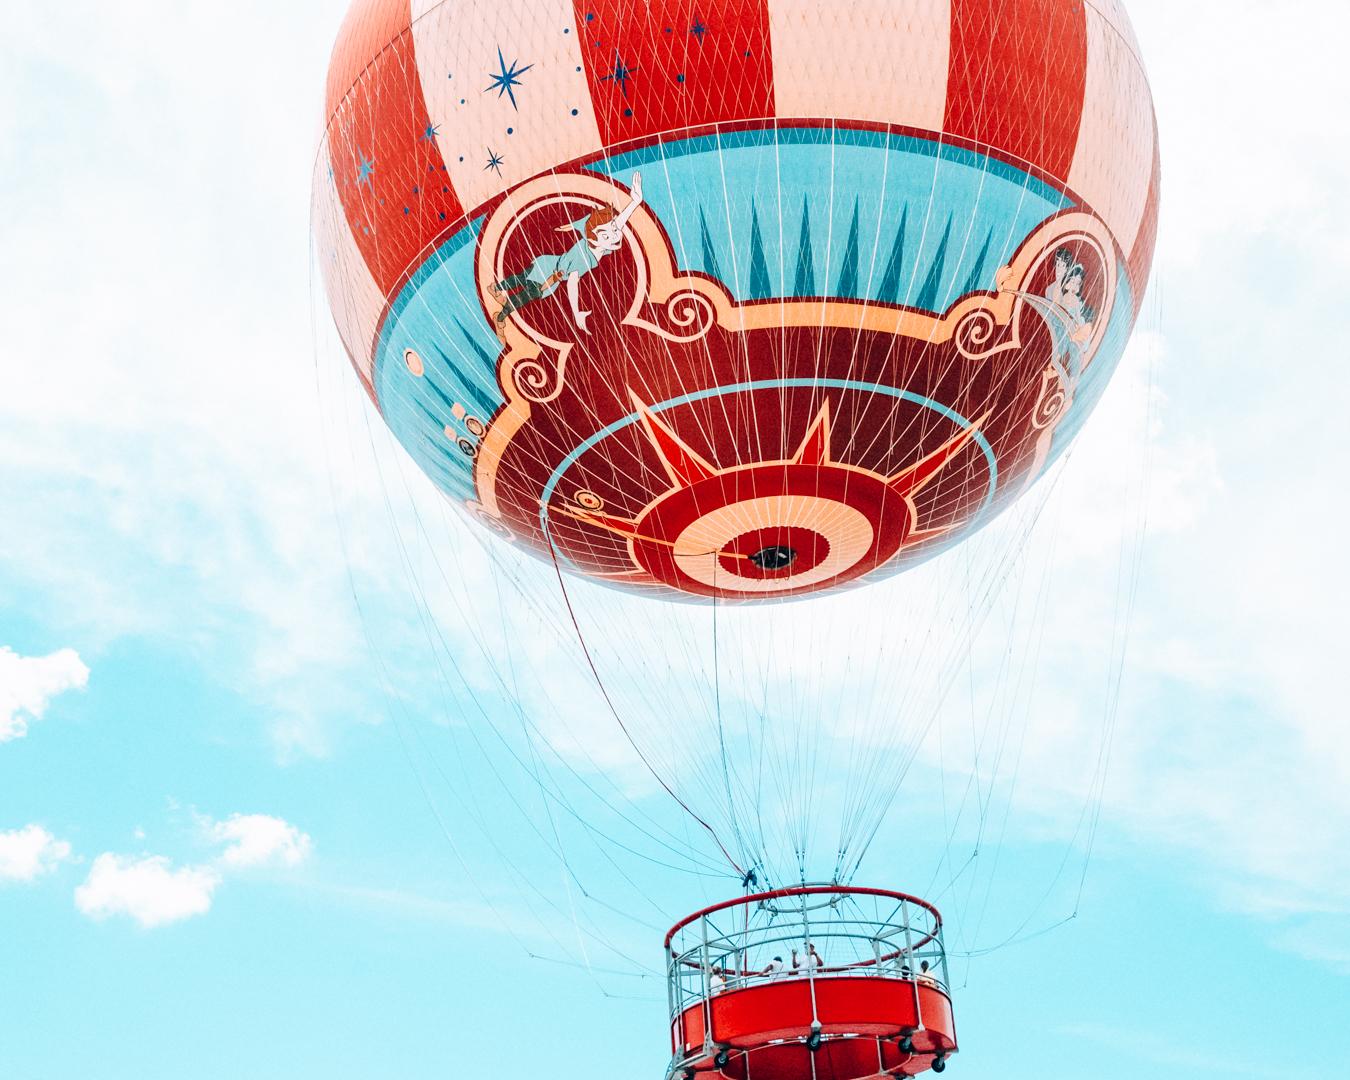 Hot air balloon at Disney Springs in Orlando